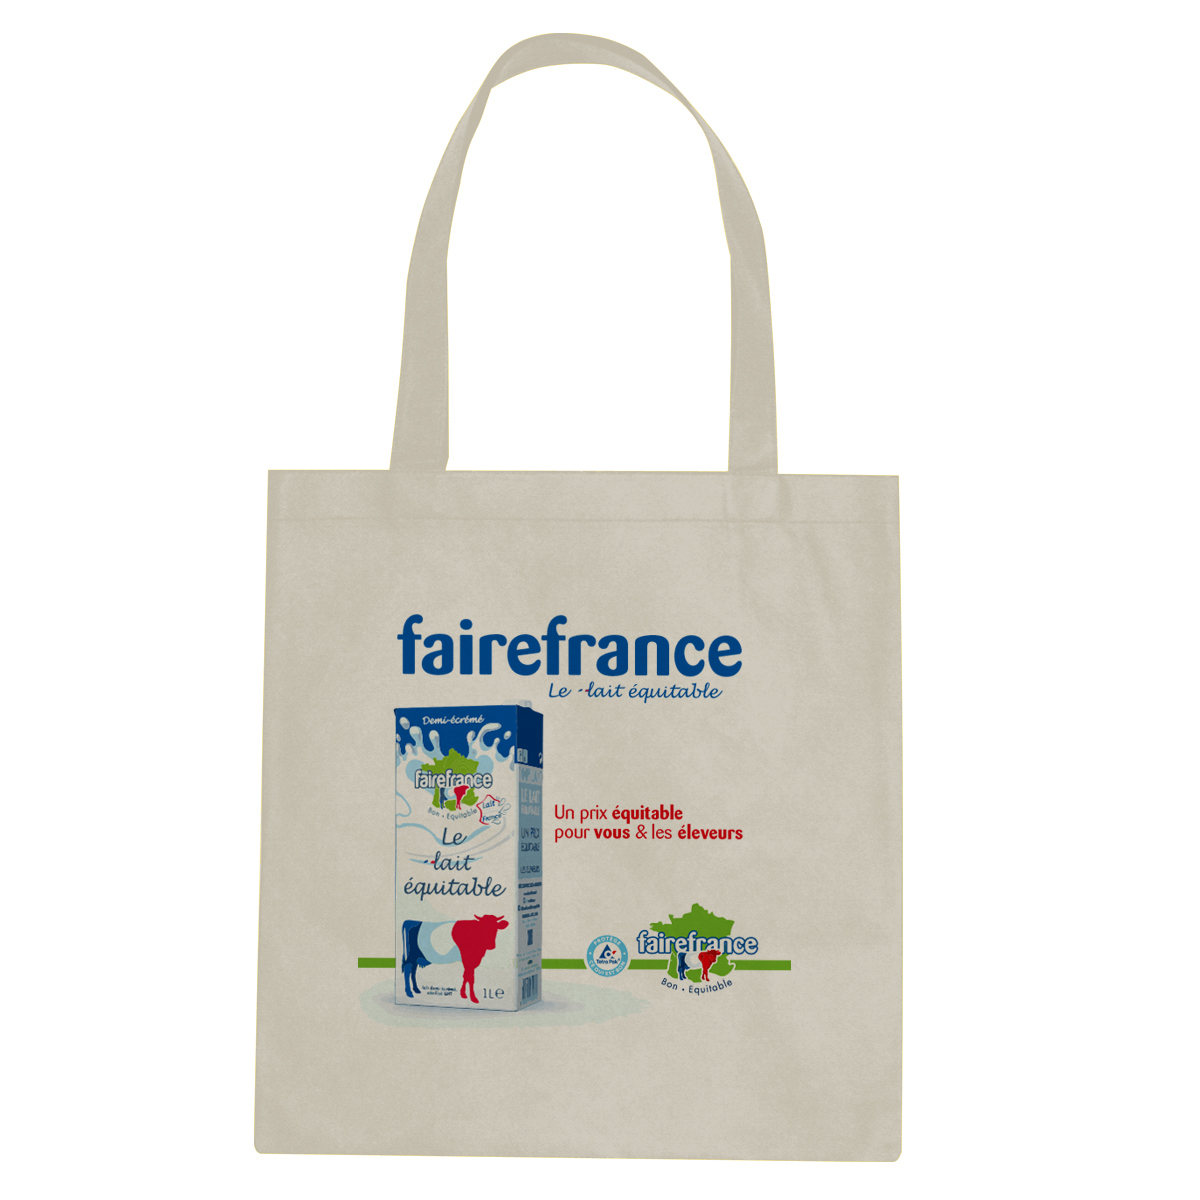 ToteBag_fairefrance-1526400198.jpg